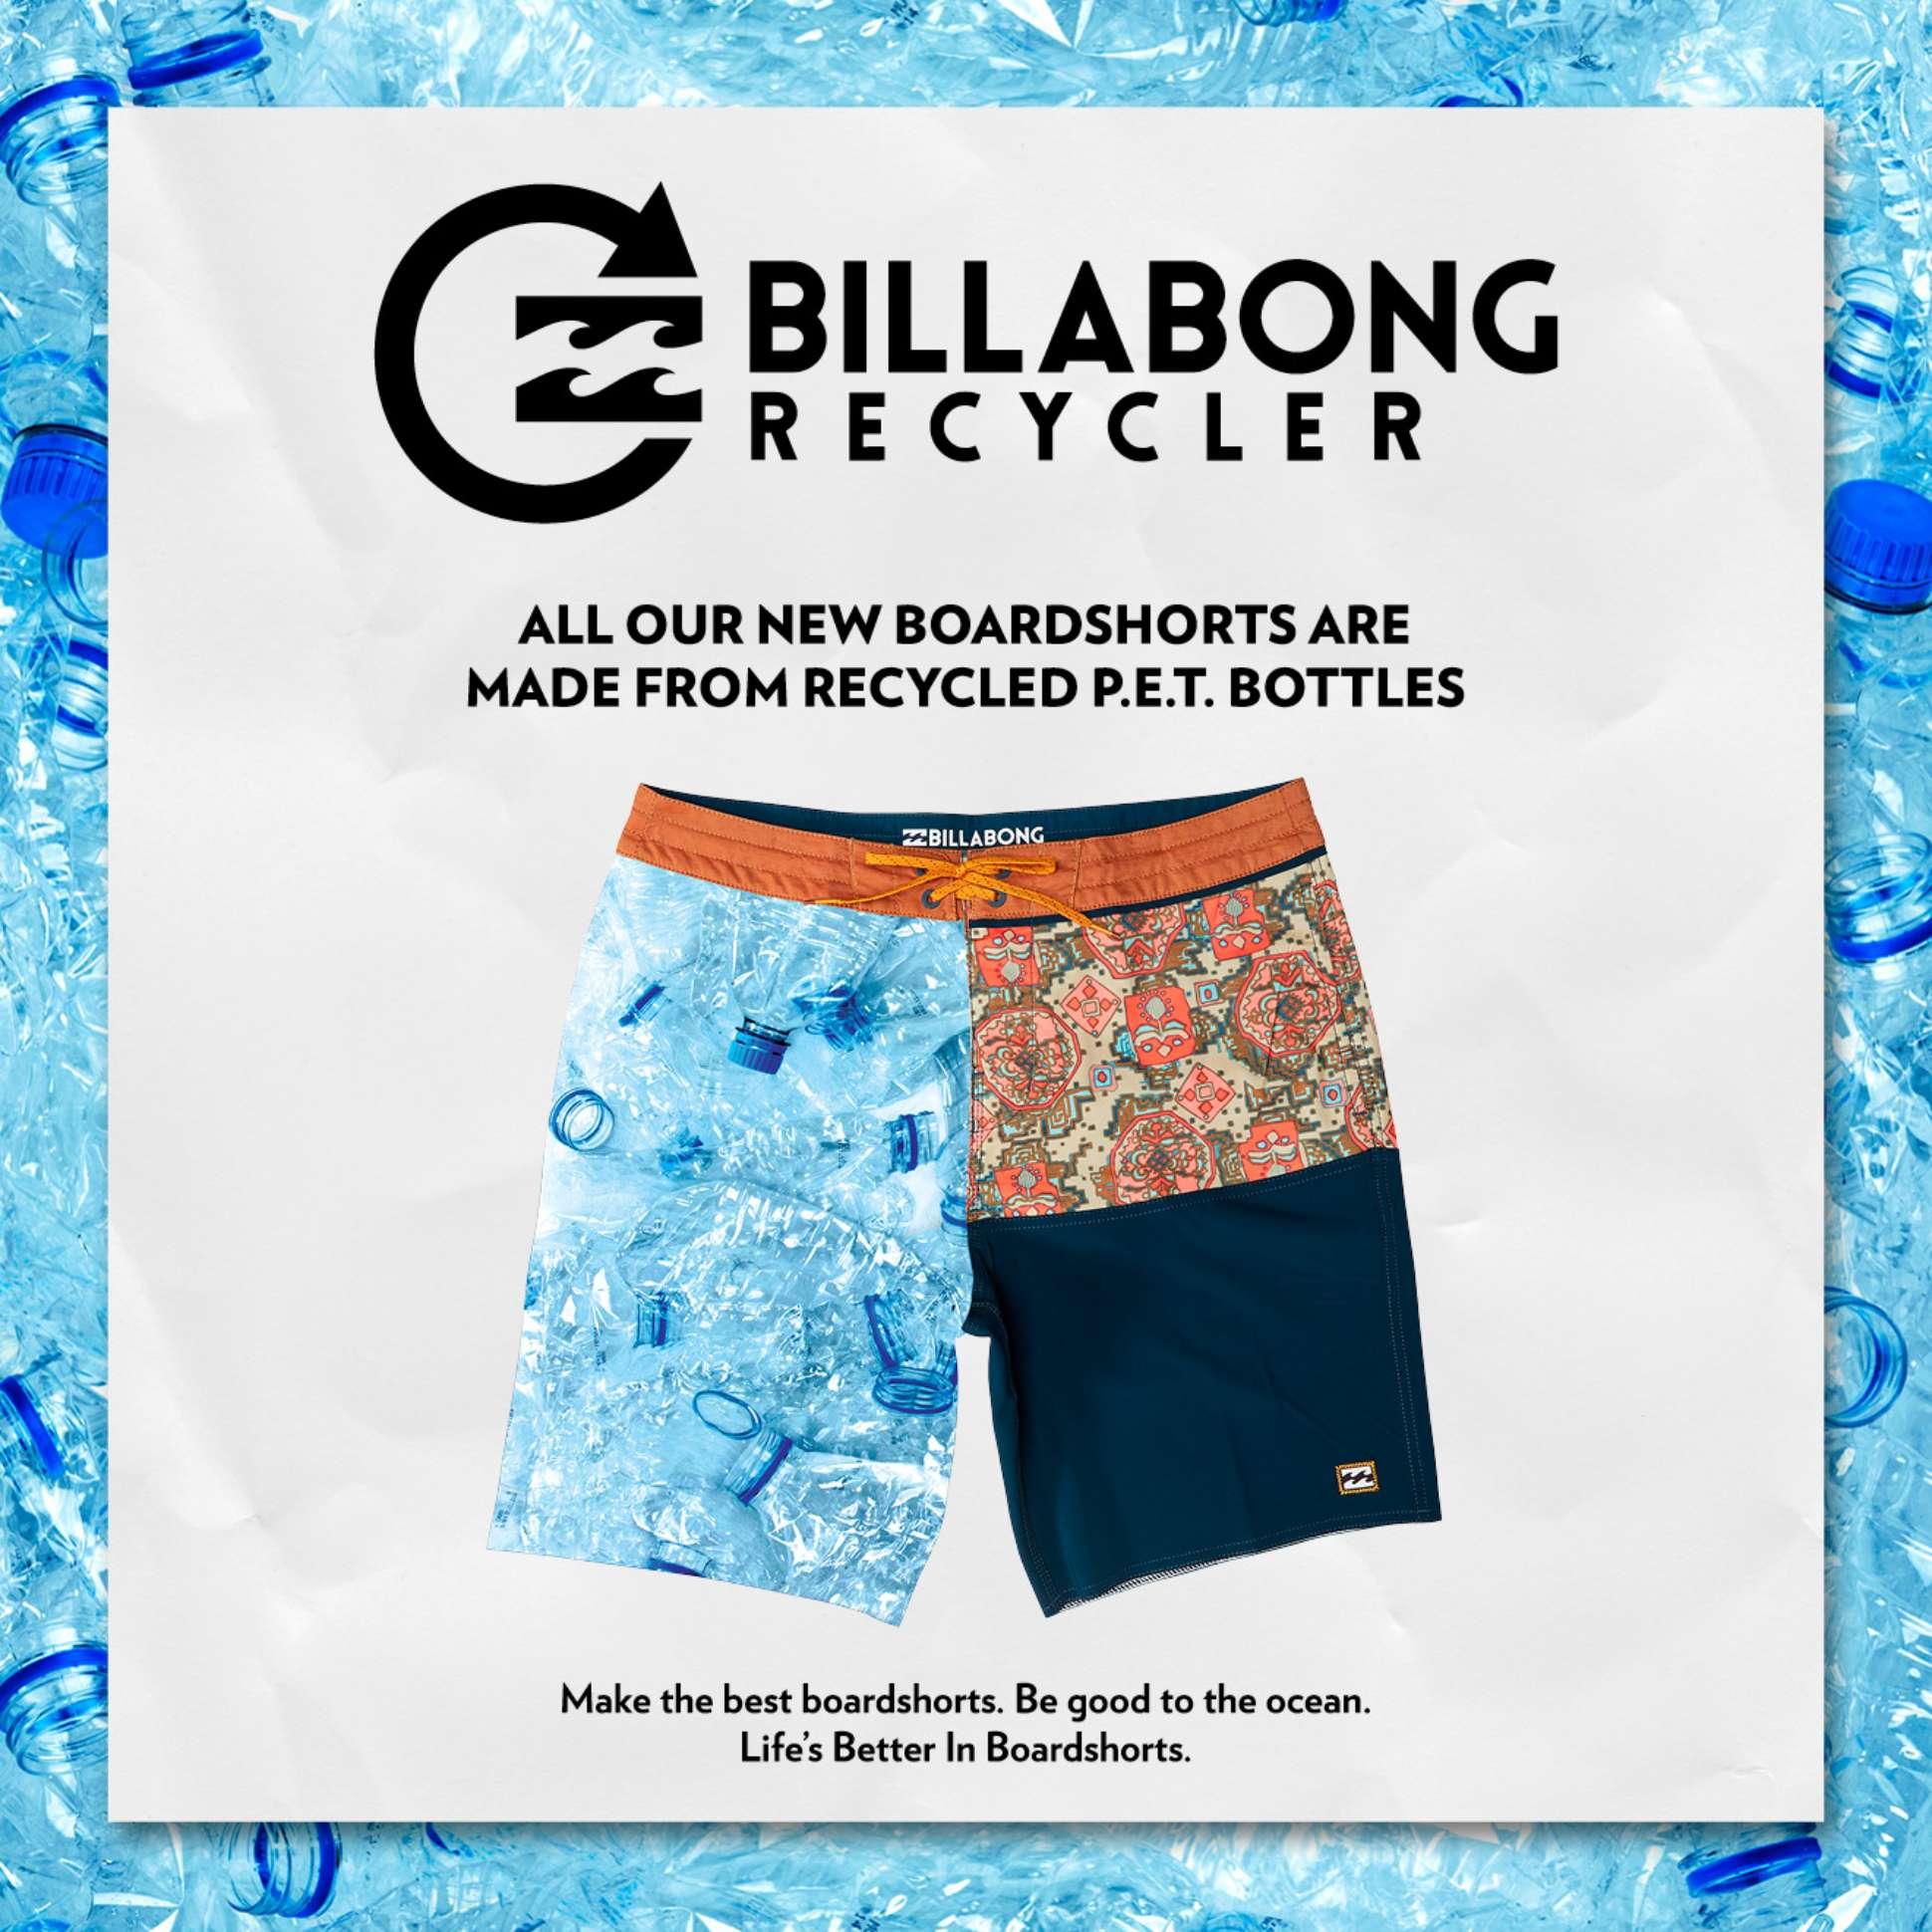 Billabong Recycler